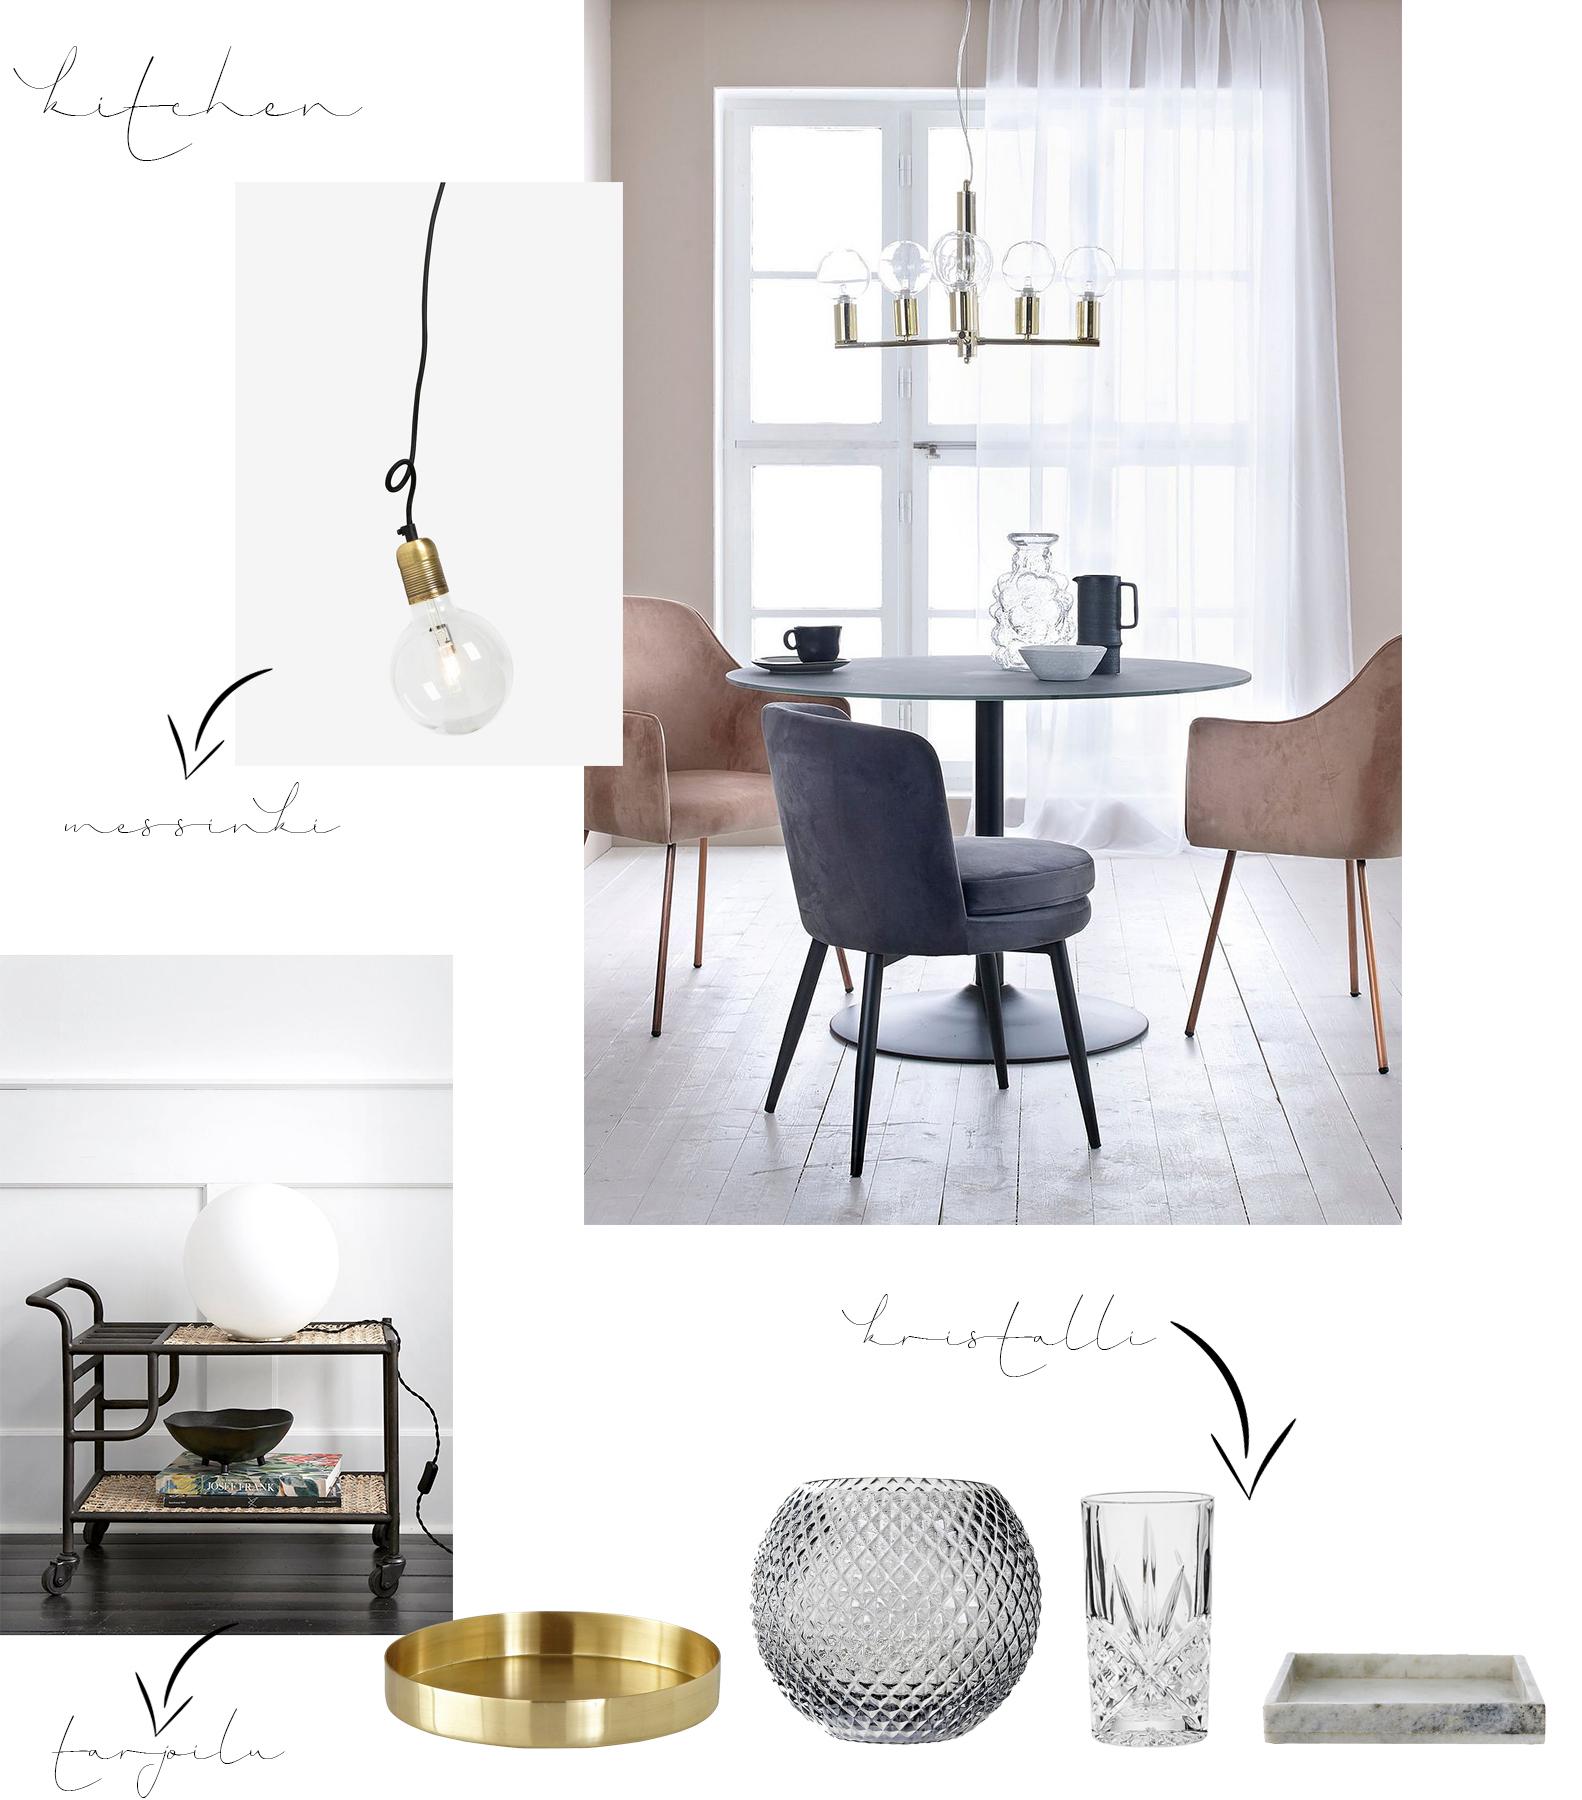 Char and the city, Keittiö / Kitchen, sisustus / interior, sale pics from Ellos, Room21, Jotex